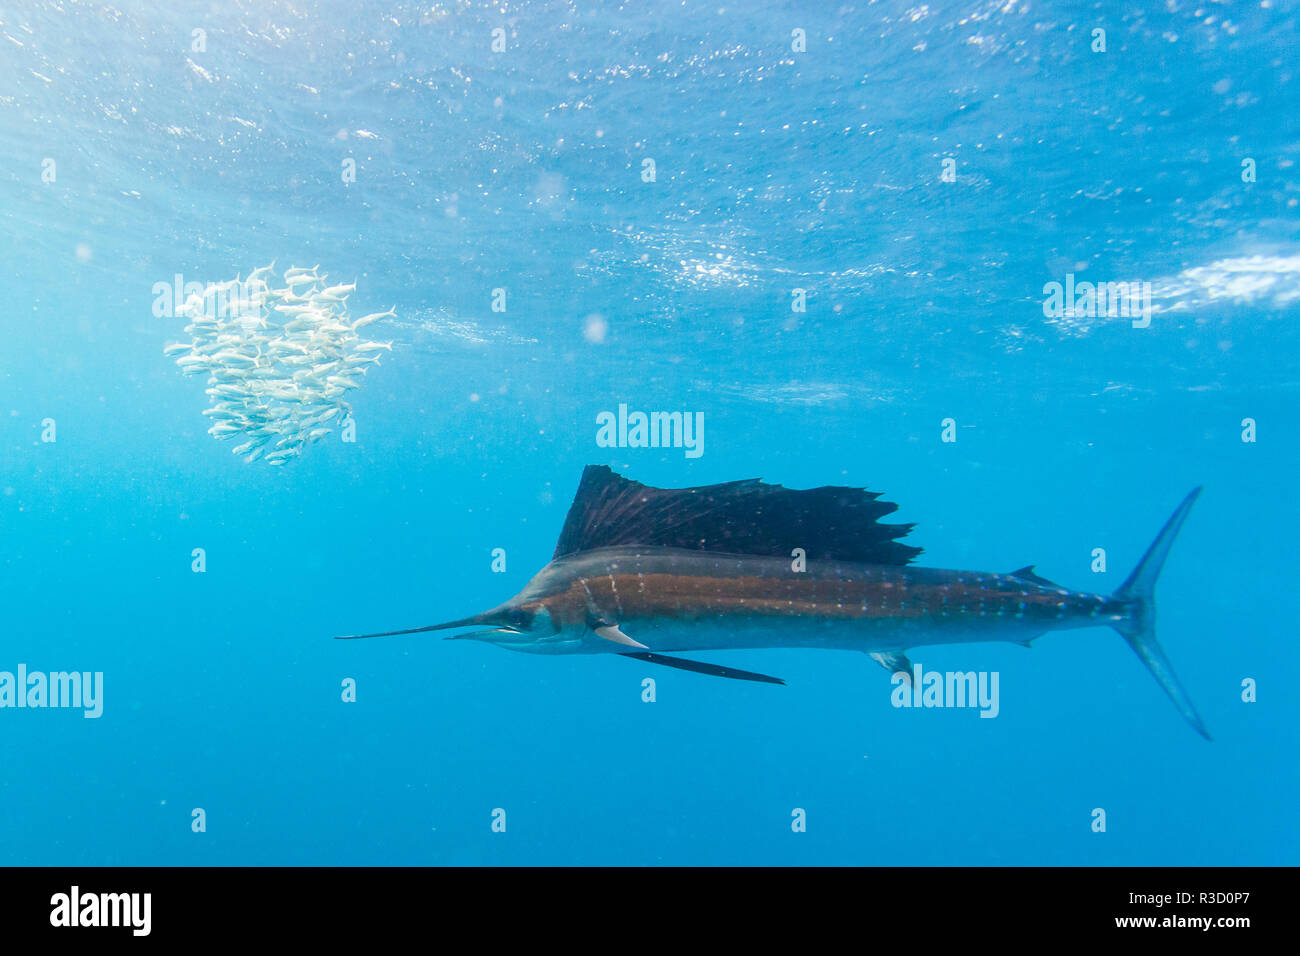 Sailfish (Istiophorus albicans) feeding on Brazilian Sardines about 10 miles offshore from Isla Mujeres, Yucatan Peninsula, Mexico - Stock Image